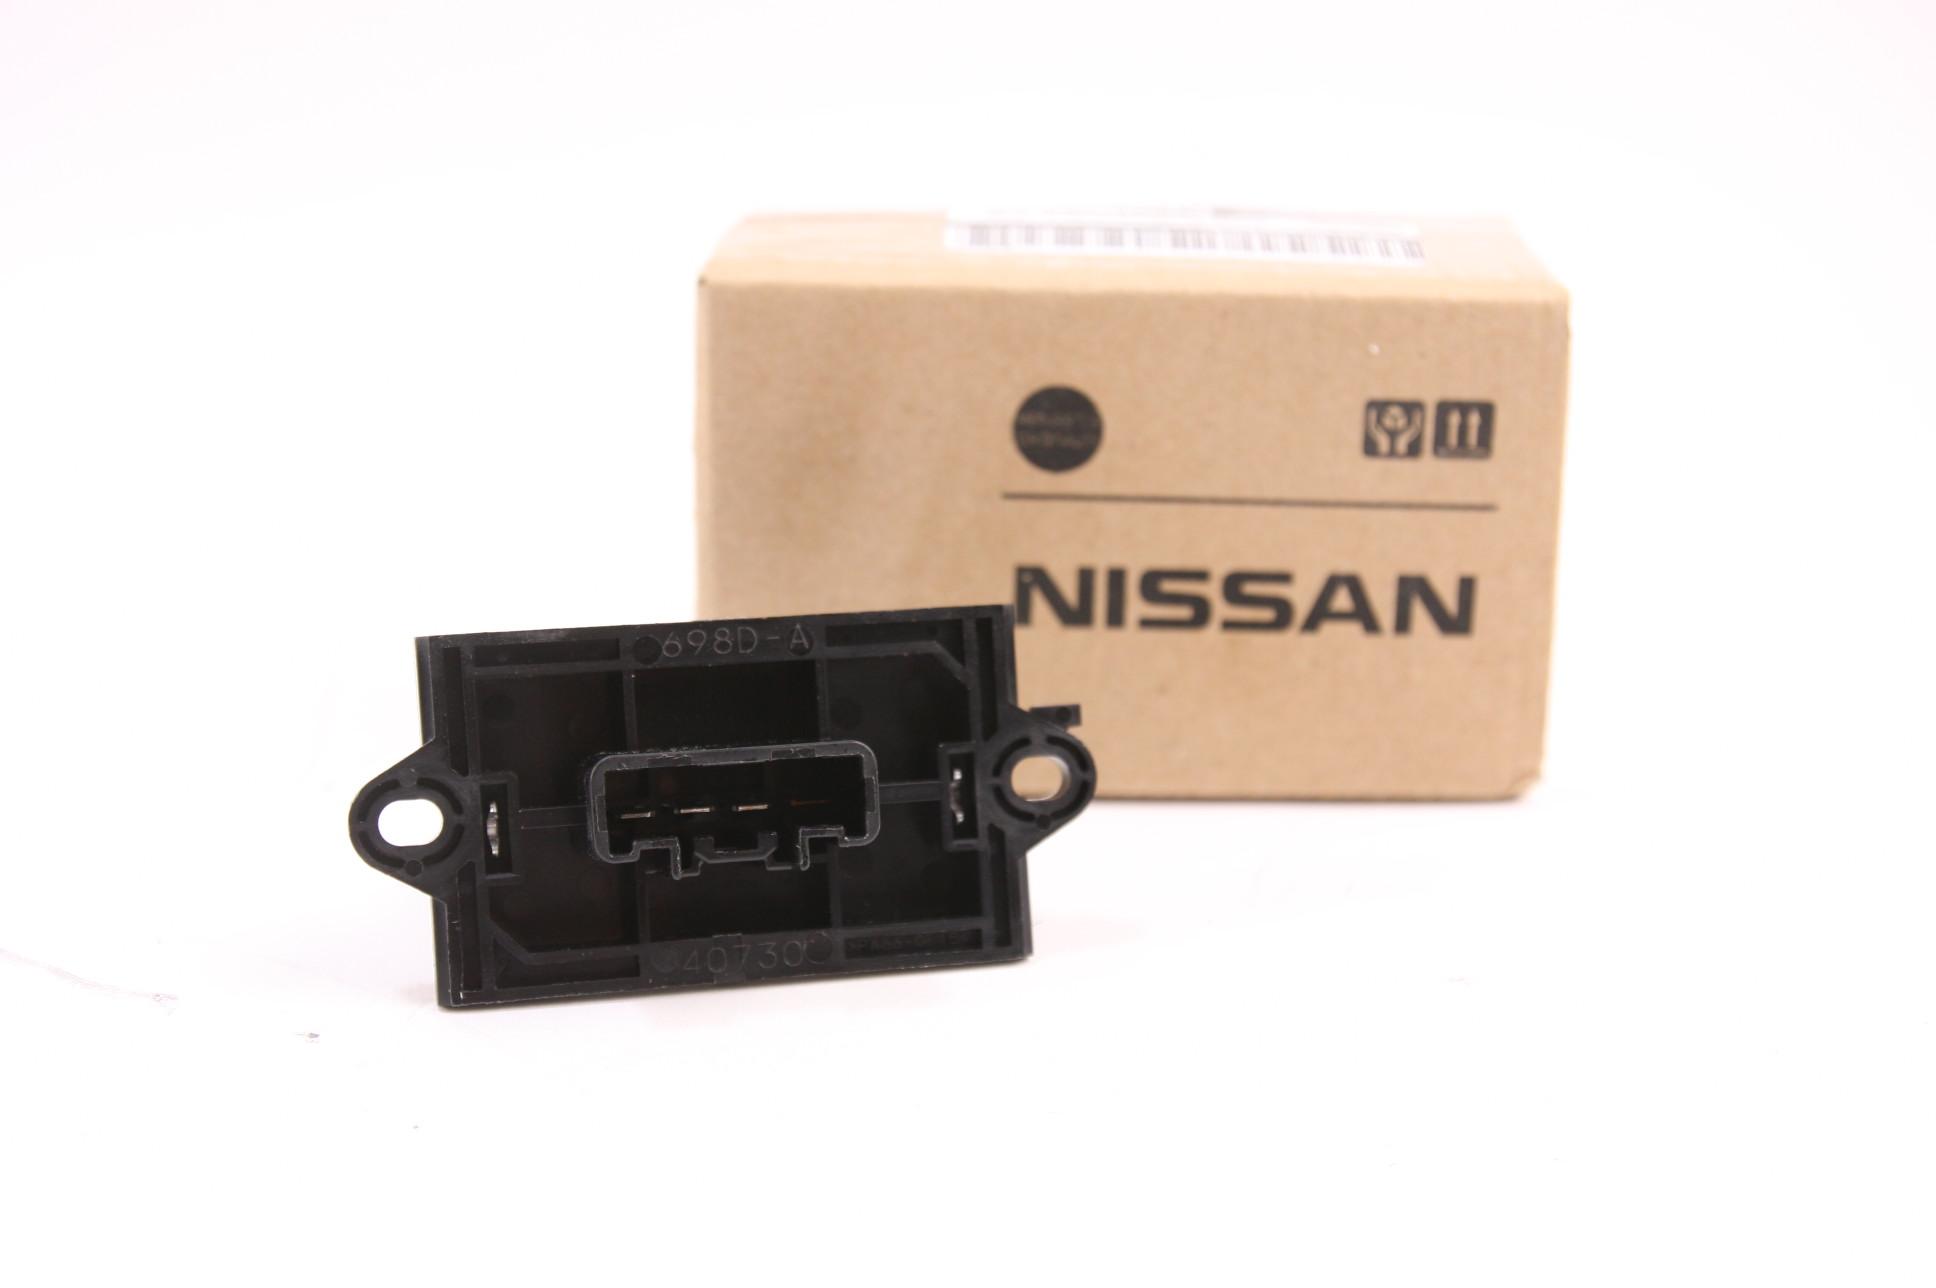 **** New OEM Nissan 27150-ED00A A/C Blower Motor Resistor Fast Free Shipping NIP - image 1